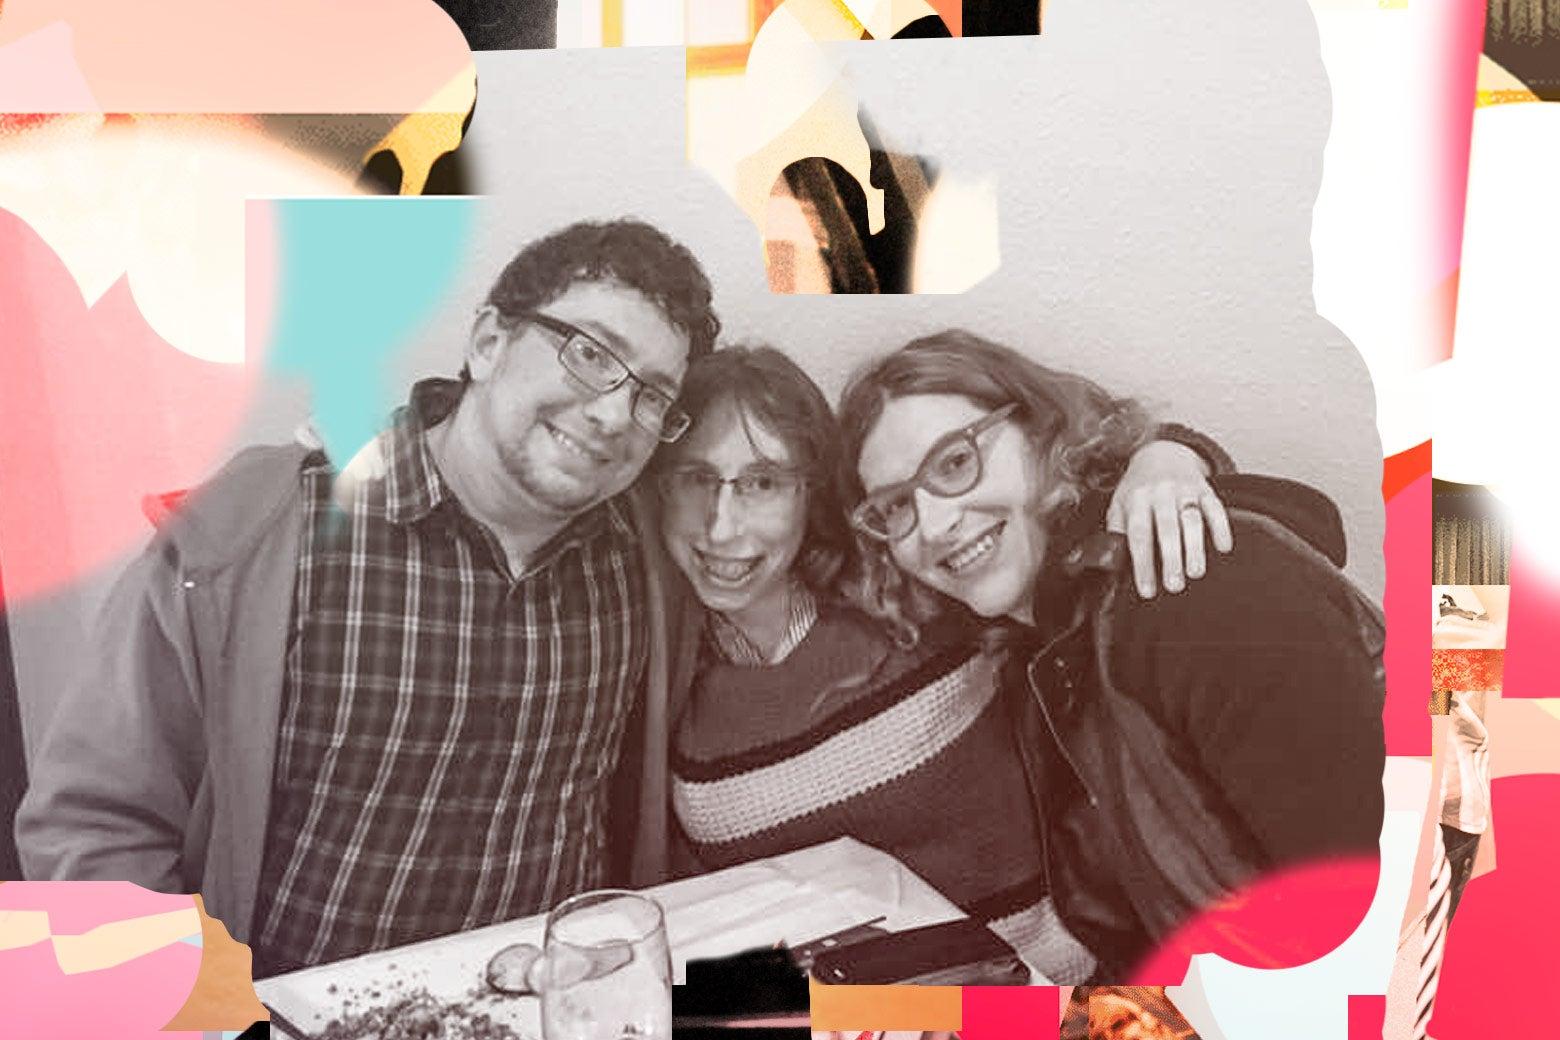 Evan, Cassie, and Mandy celebrate a birthday.